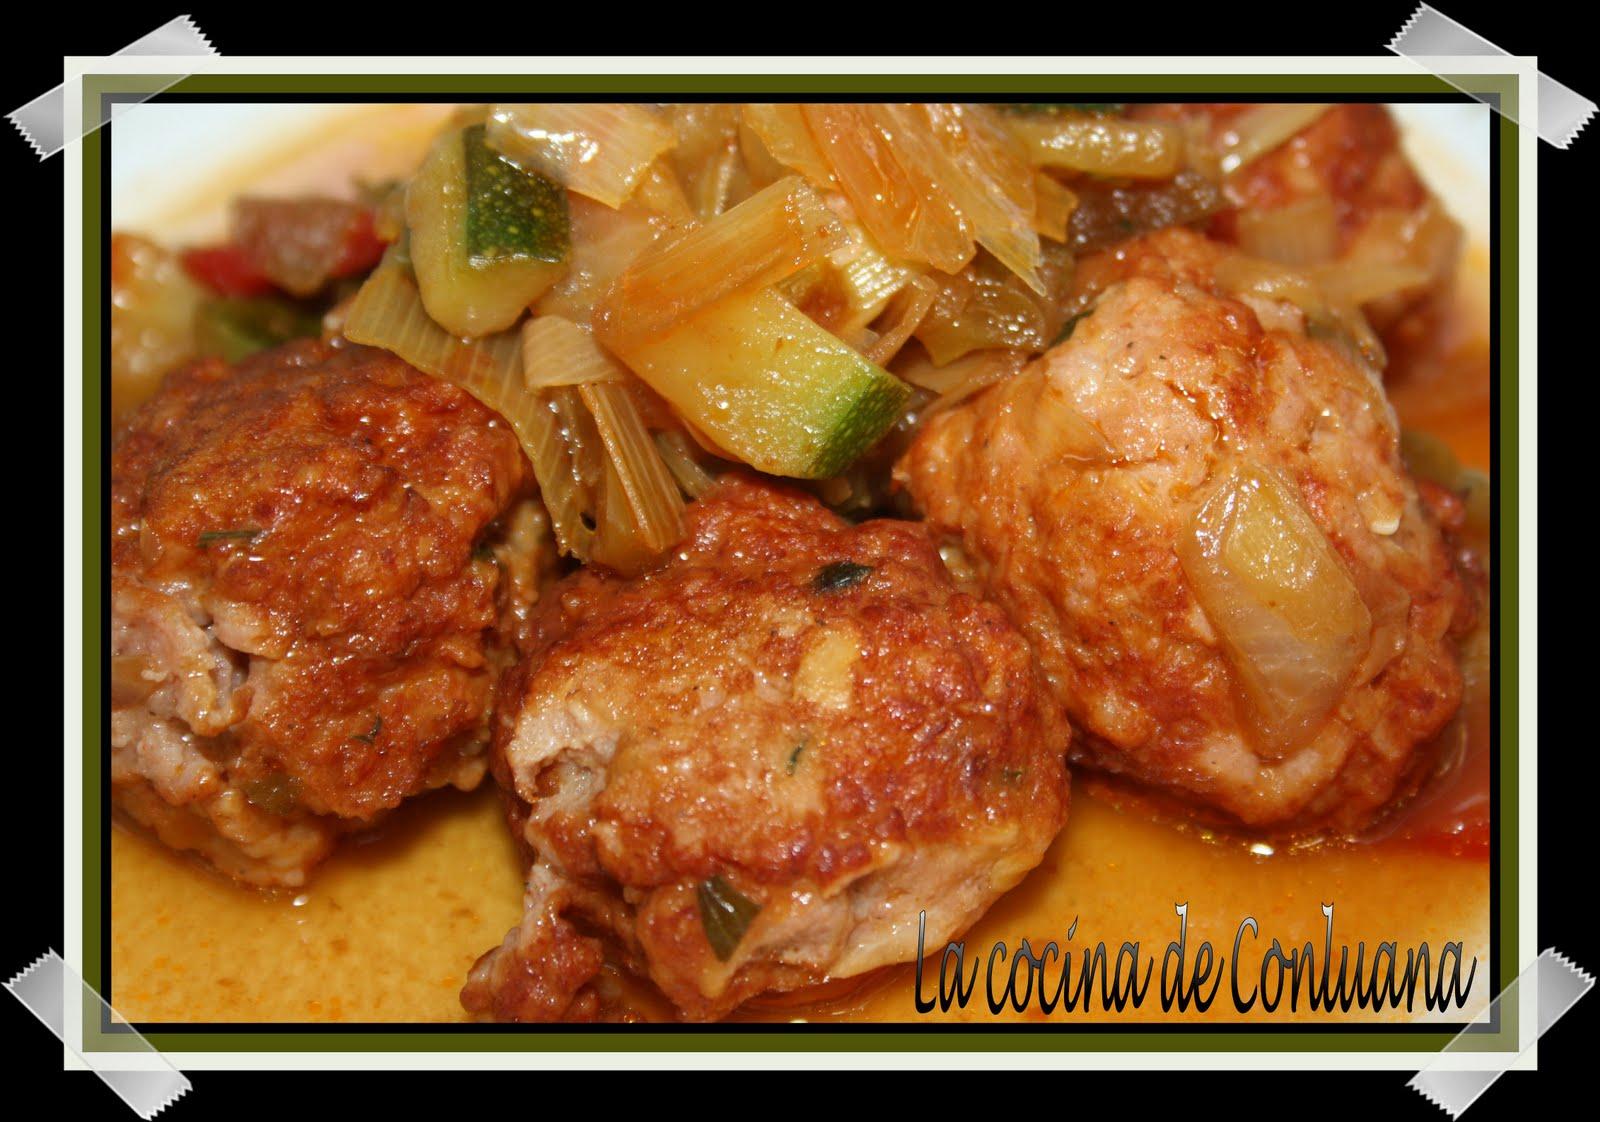 La cocina de conluana alb ndigas de pollo agridulces con - Albondigas de verdura ...